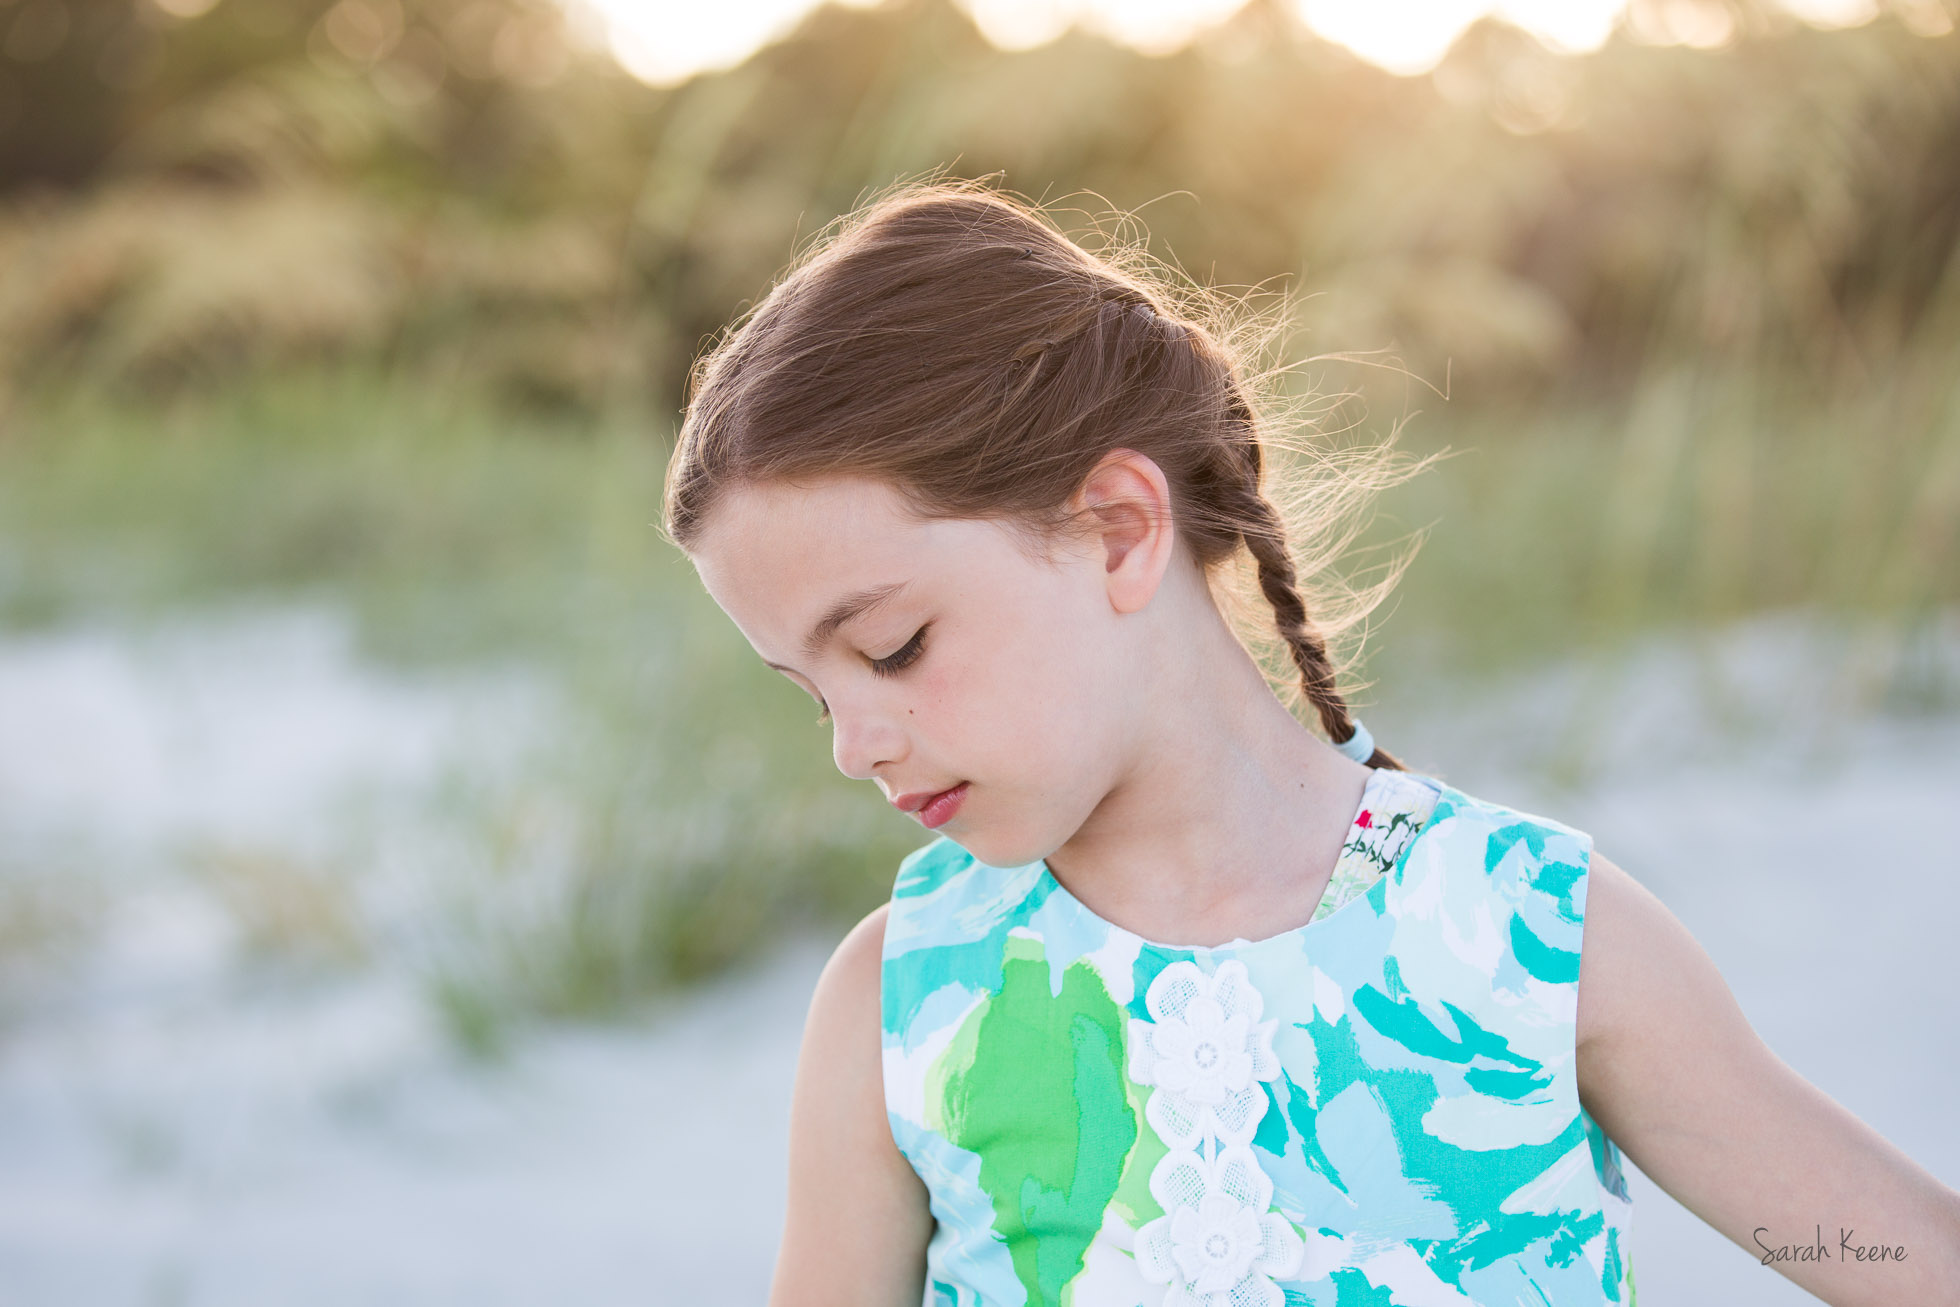 Beautiful wisps of hair lit up in a beach portrait.